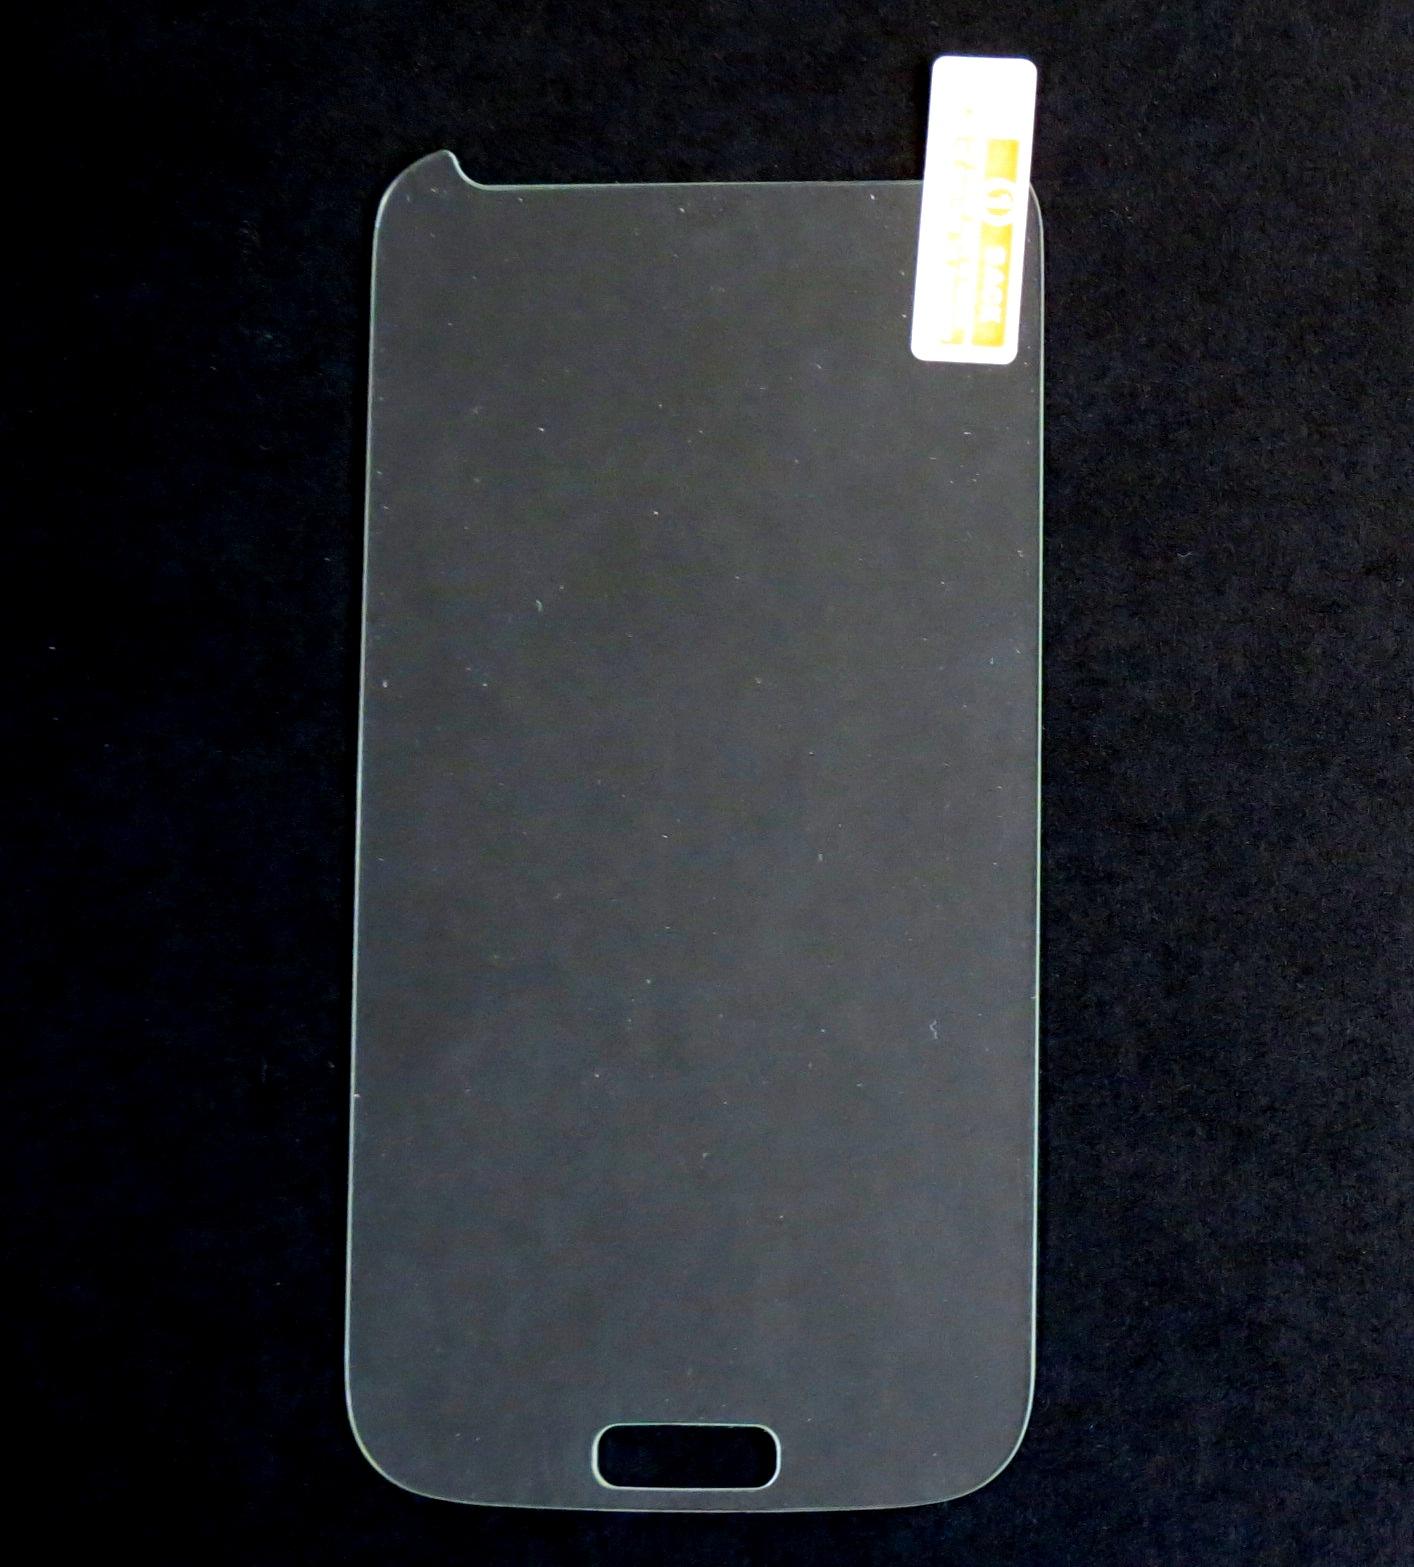 Tvrzen Sklo 03mm Pudini Pro Samsung J500 Galaxy J5 Skla